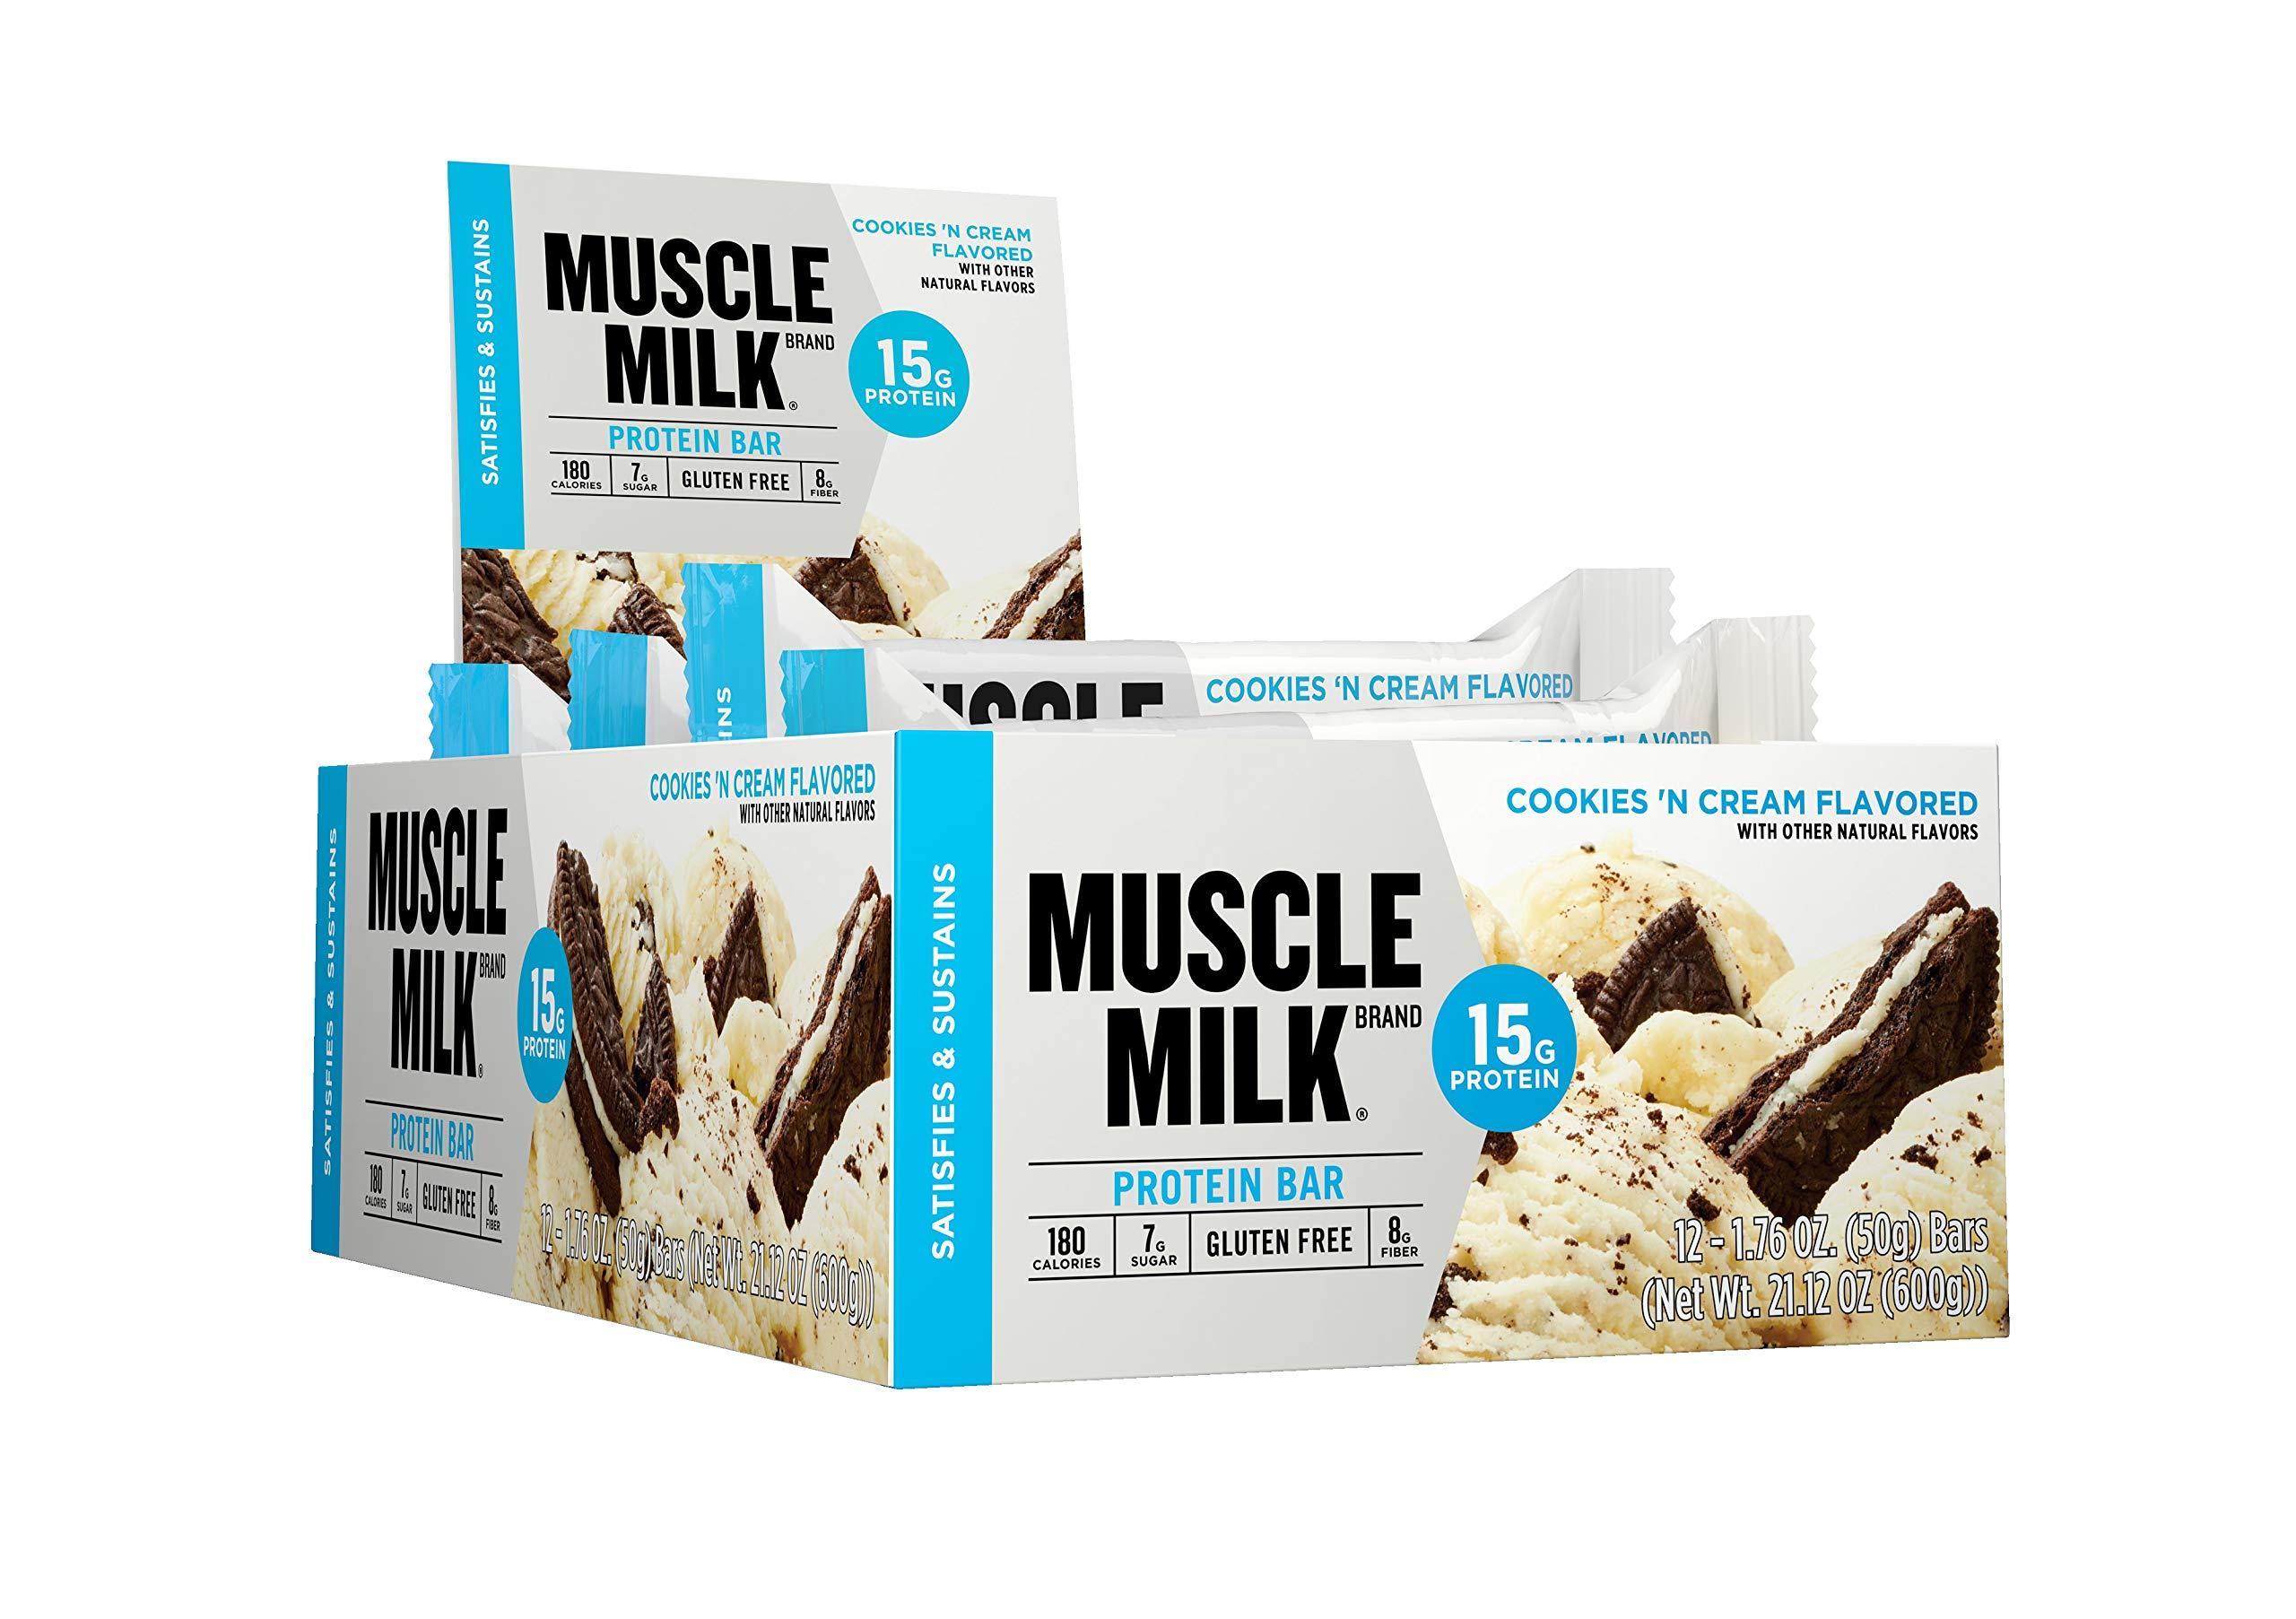 Muscle Milk Protein Bar Cookies N Cream 15g 12 Count